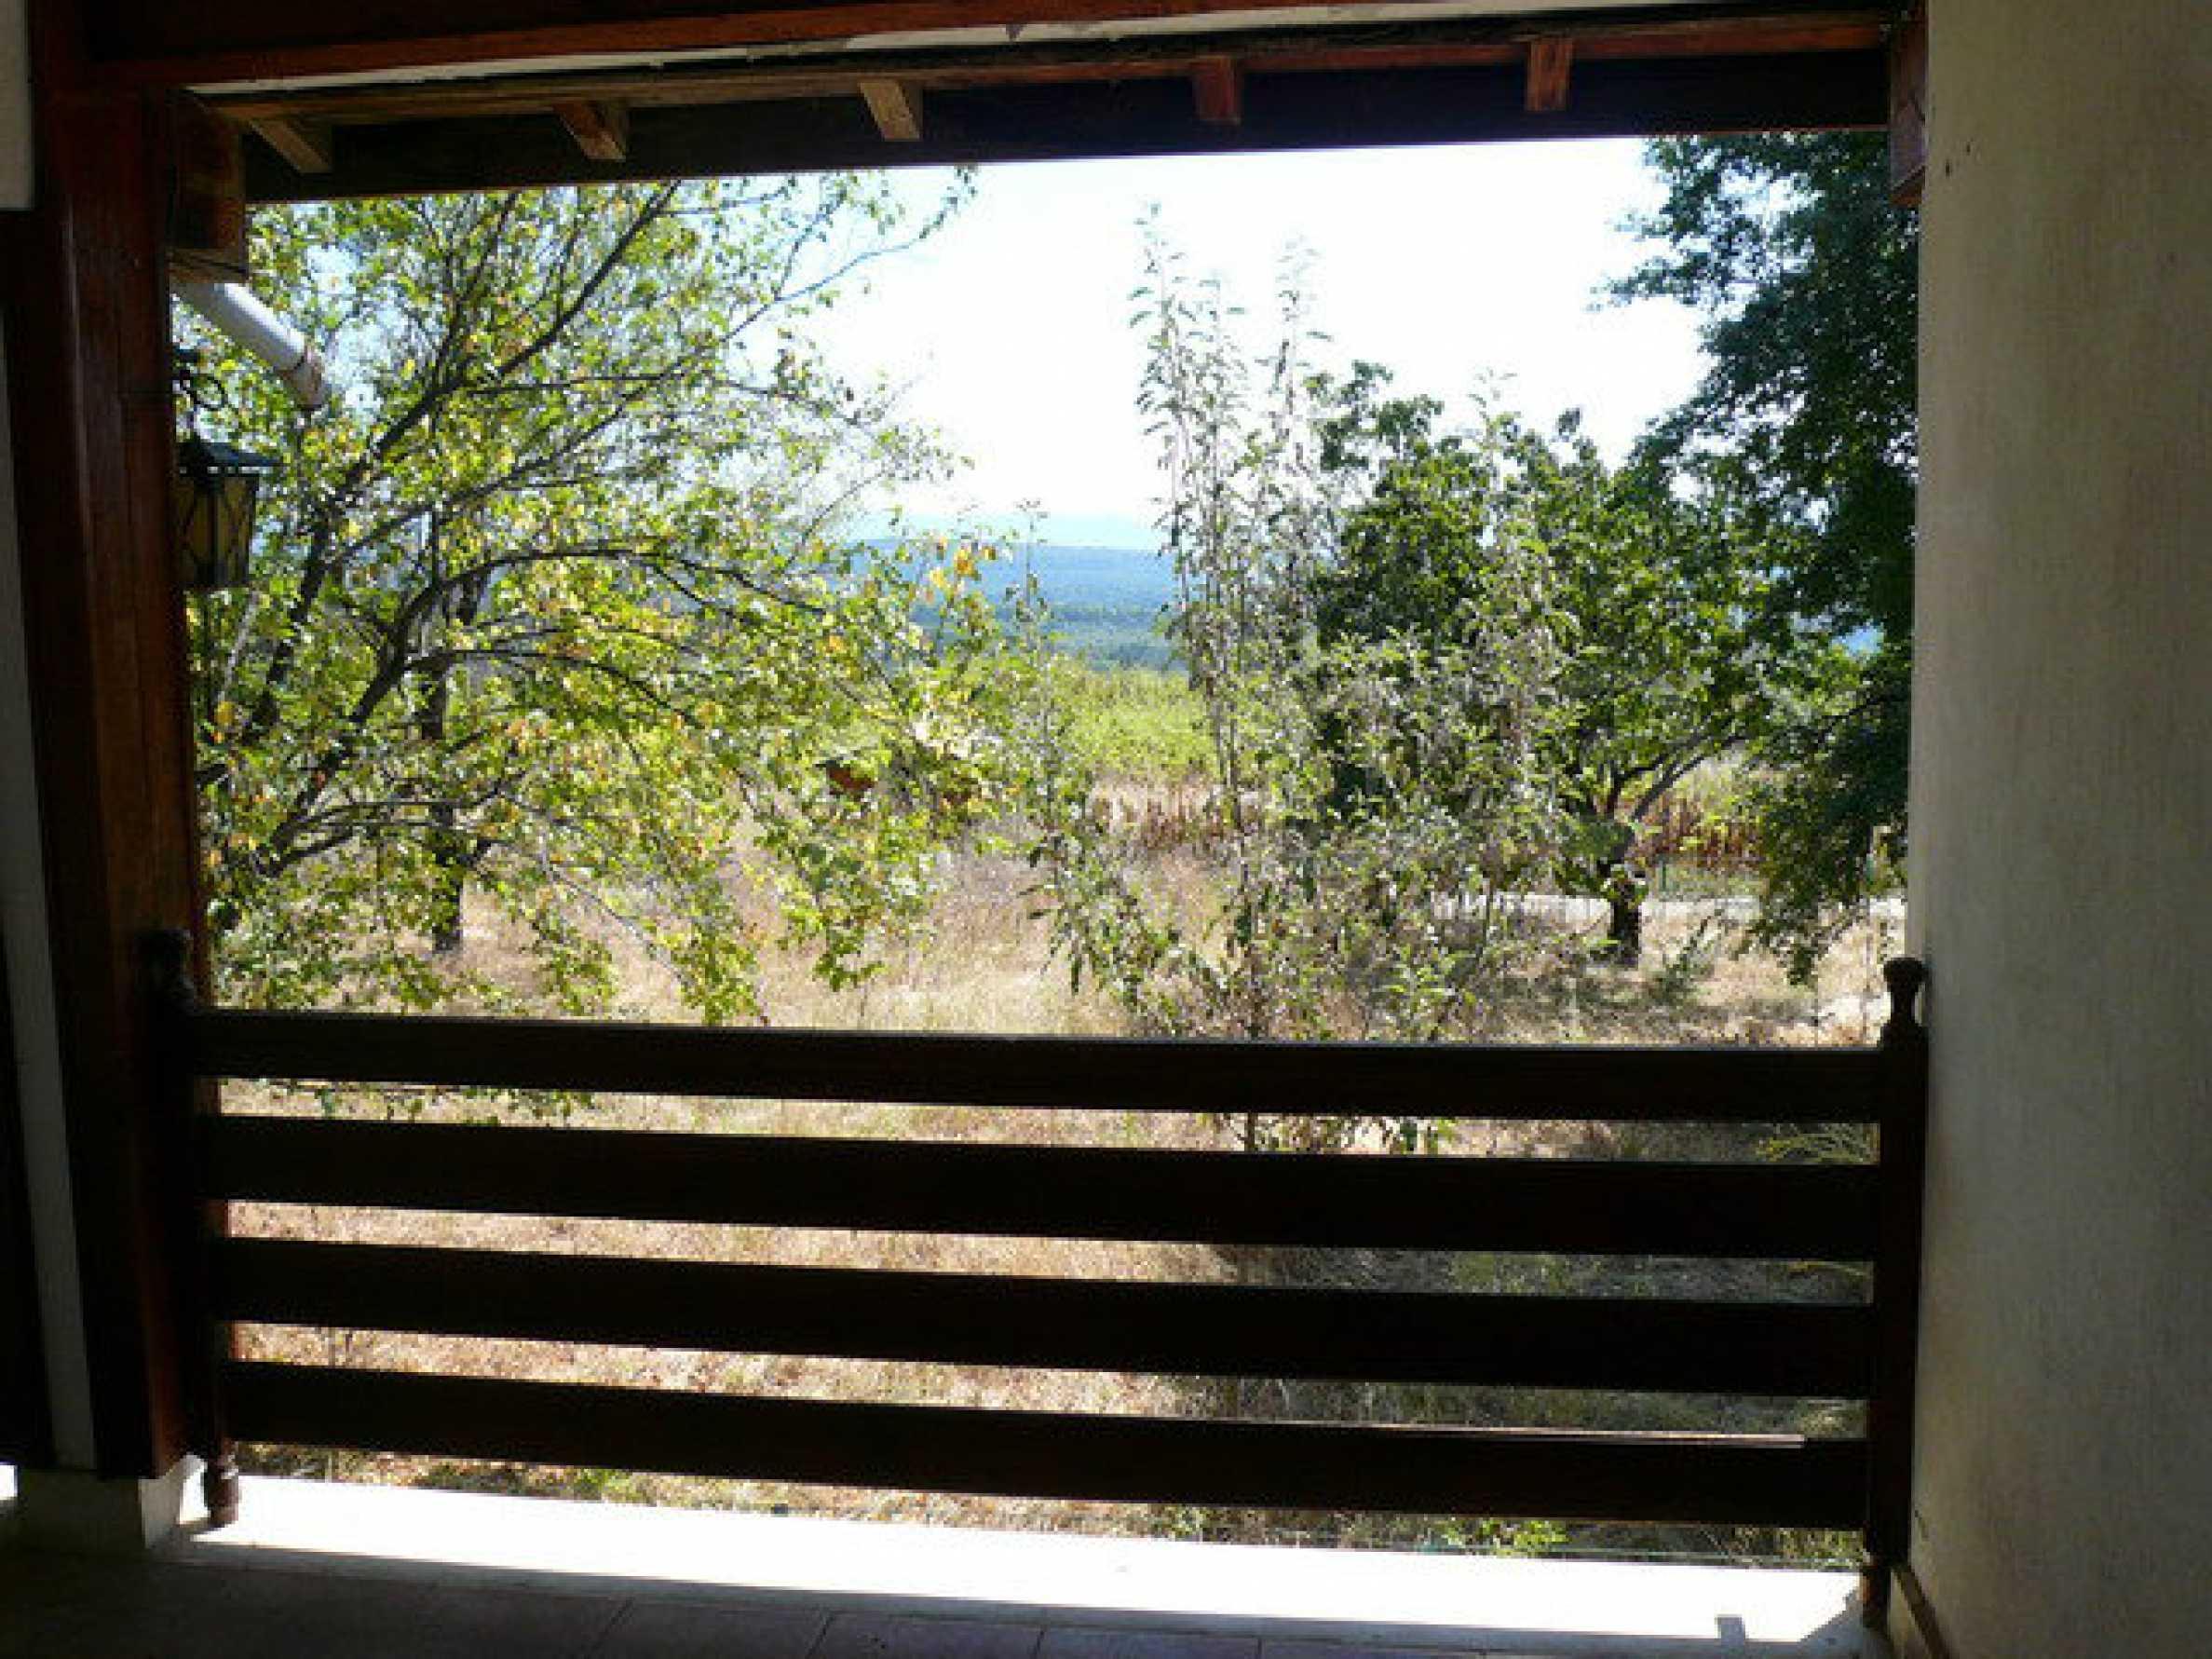 Renoviertes Haus nur 3 km von Veliko Tarnovo entfernt 36